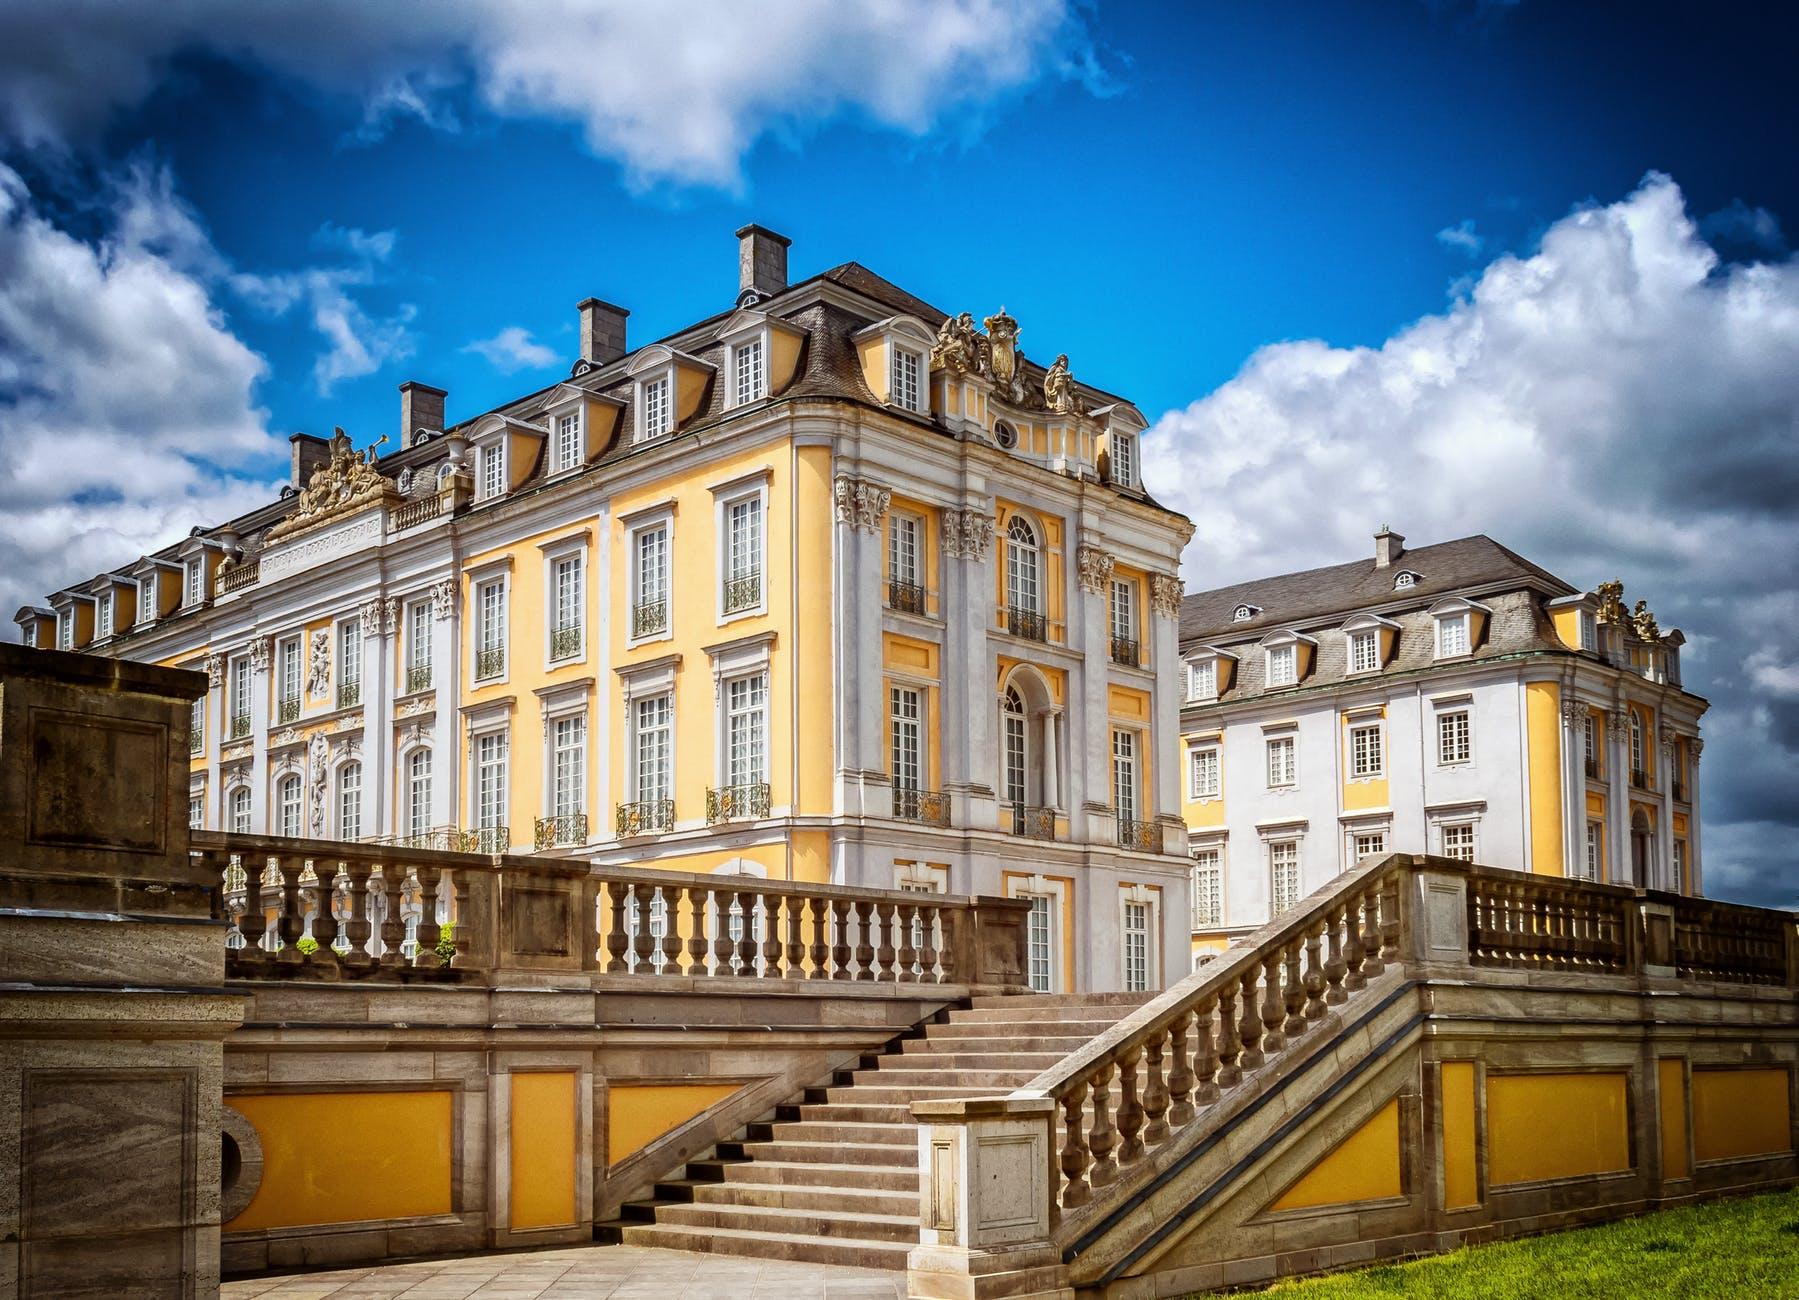 ancient architecture art augustusburg